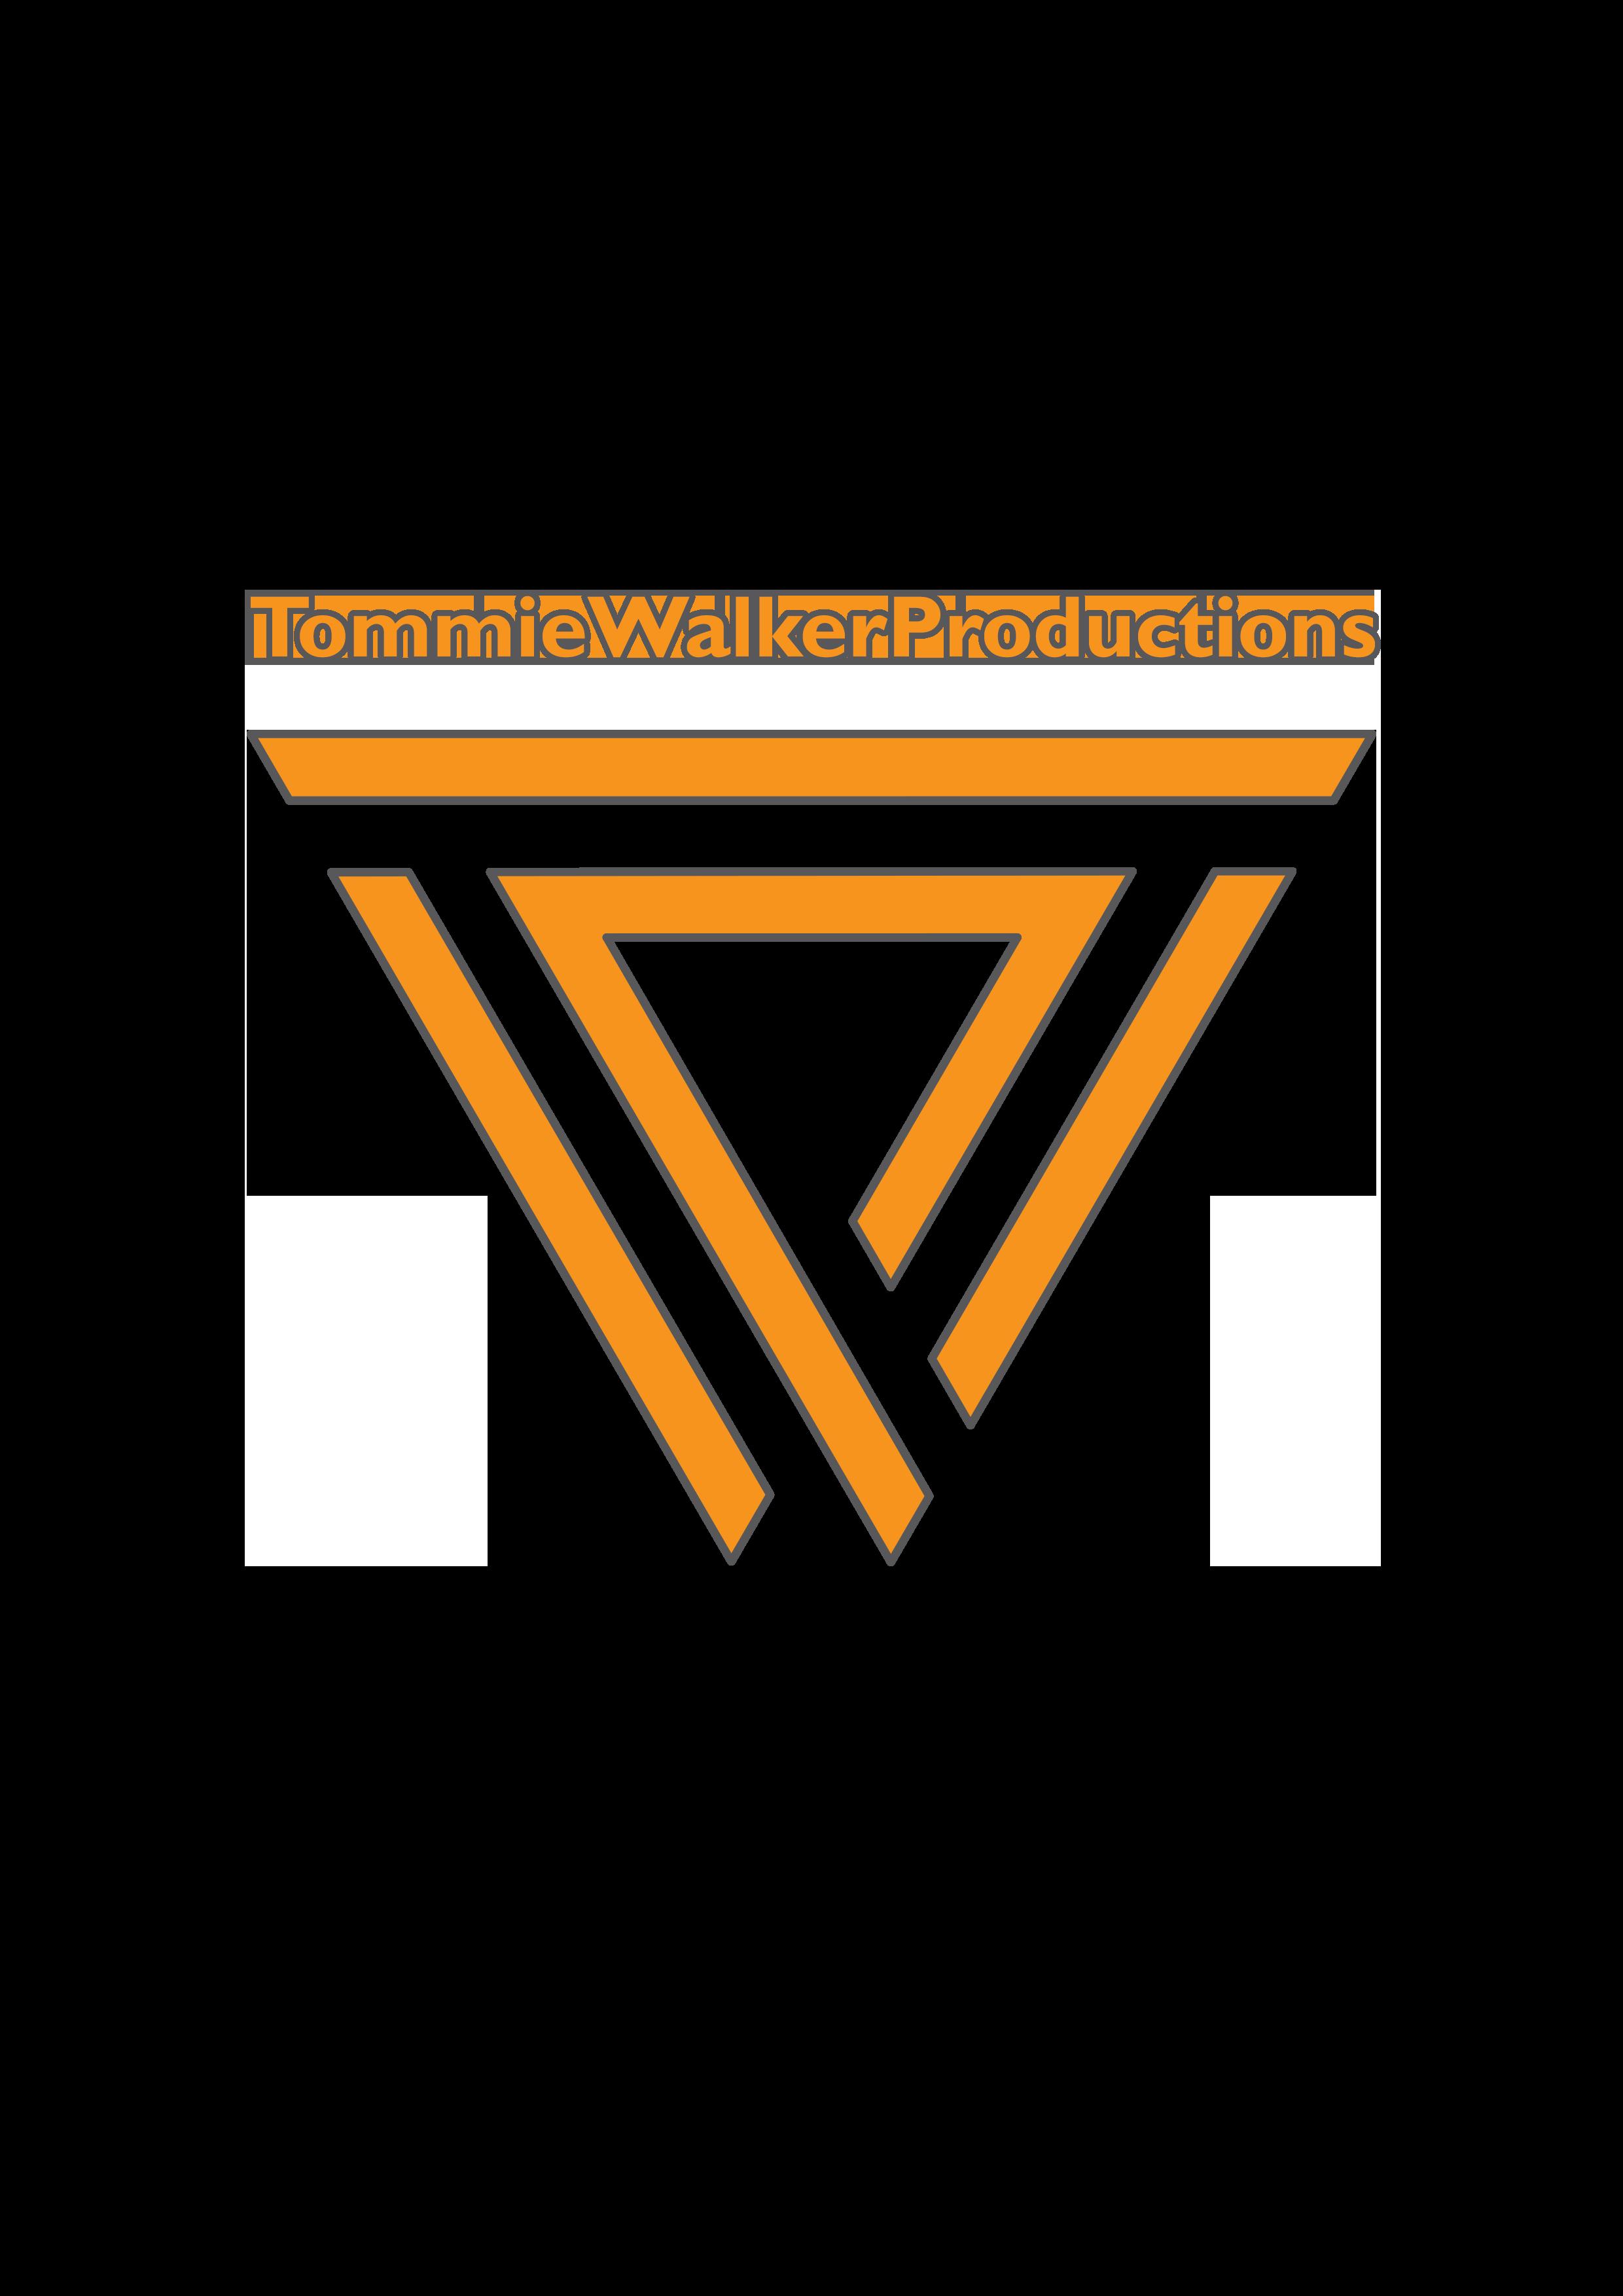 Tommie Walker Productions